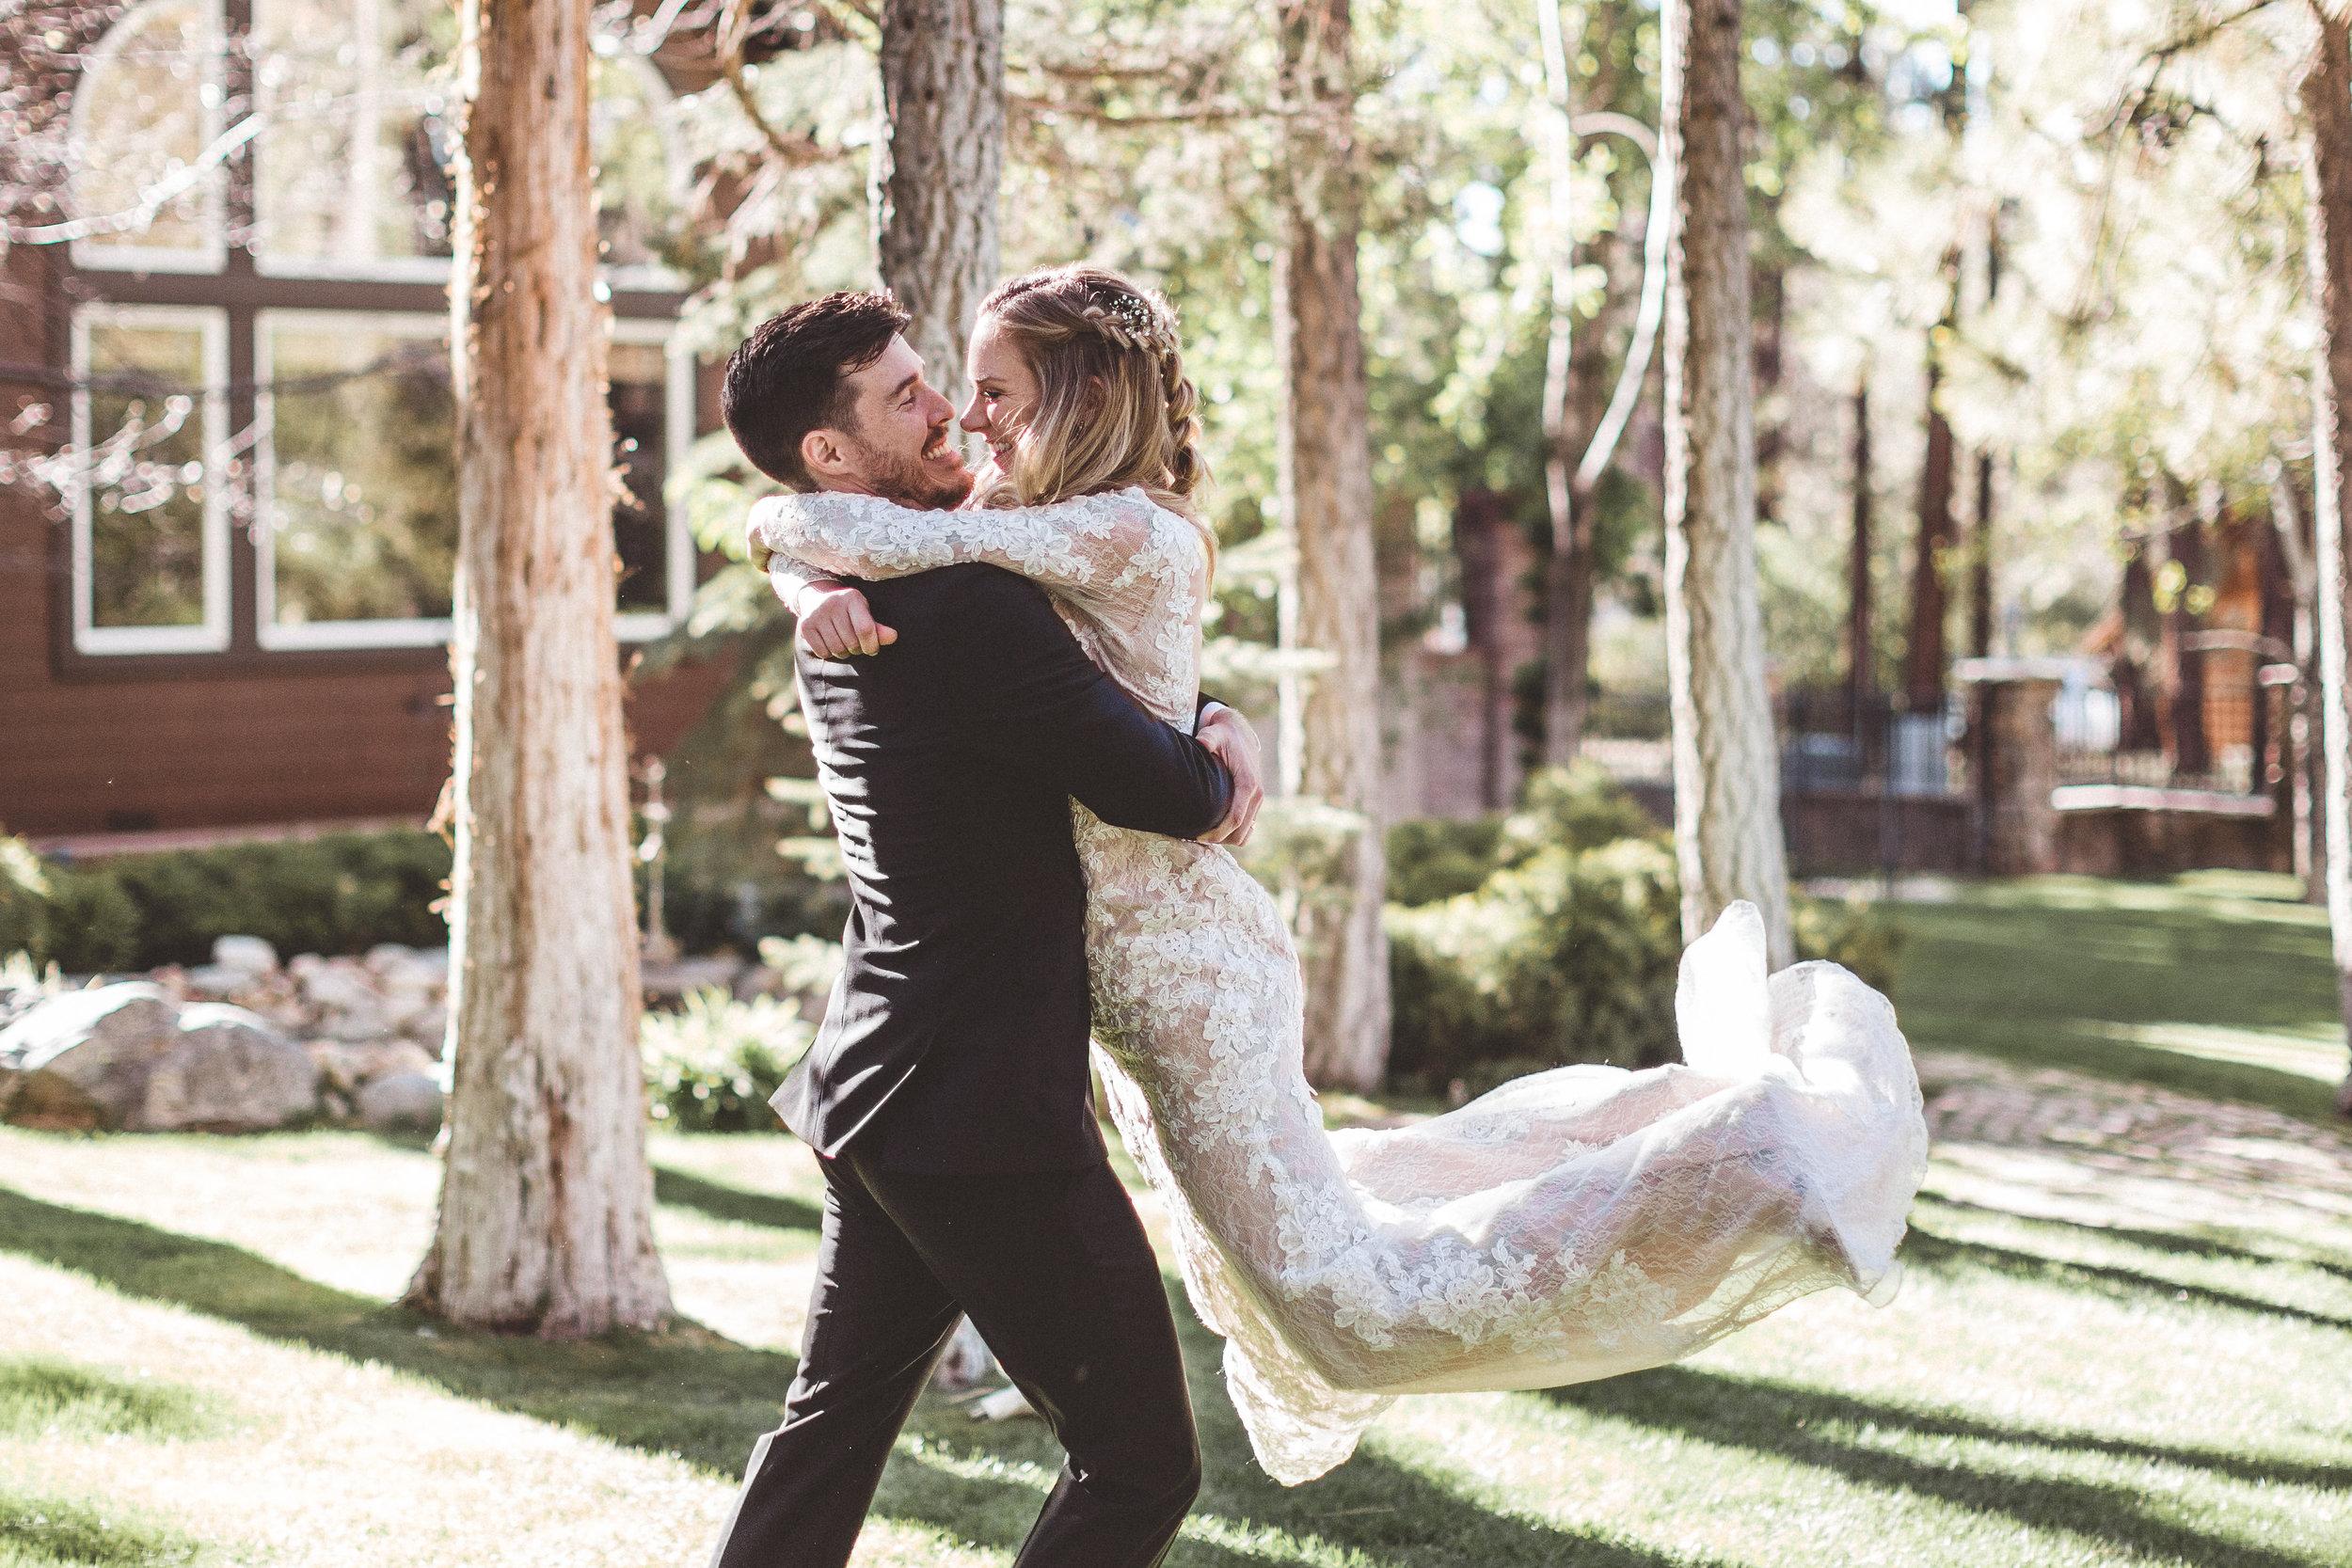 jill-and-alexs-intimates-big-bear-wedding35.jpg